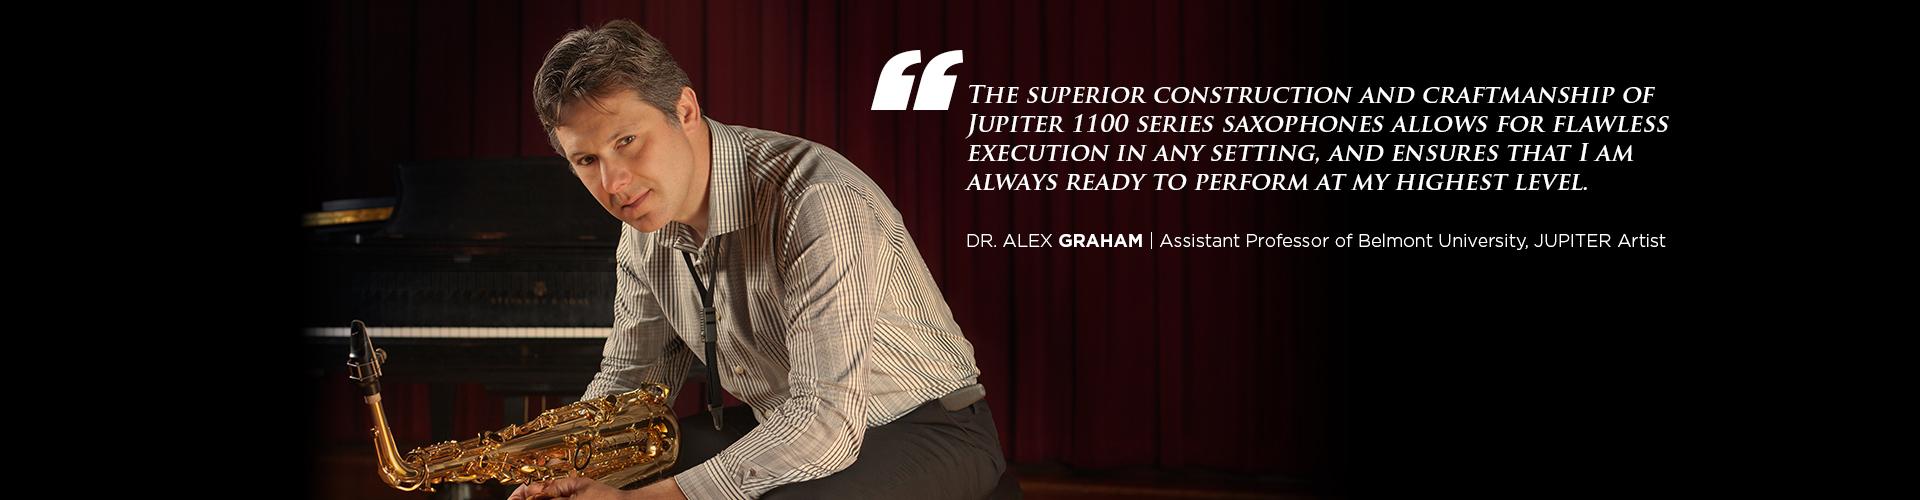 Alex Graham